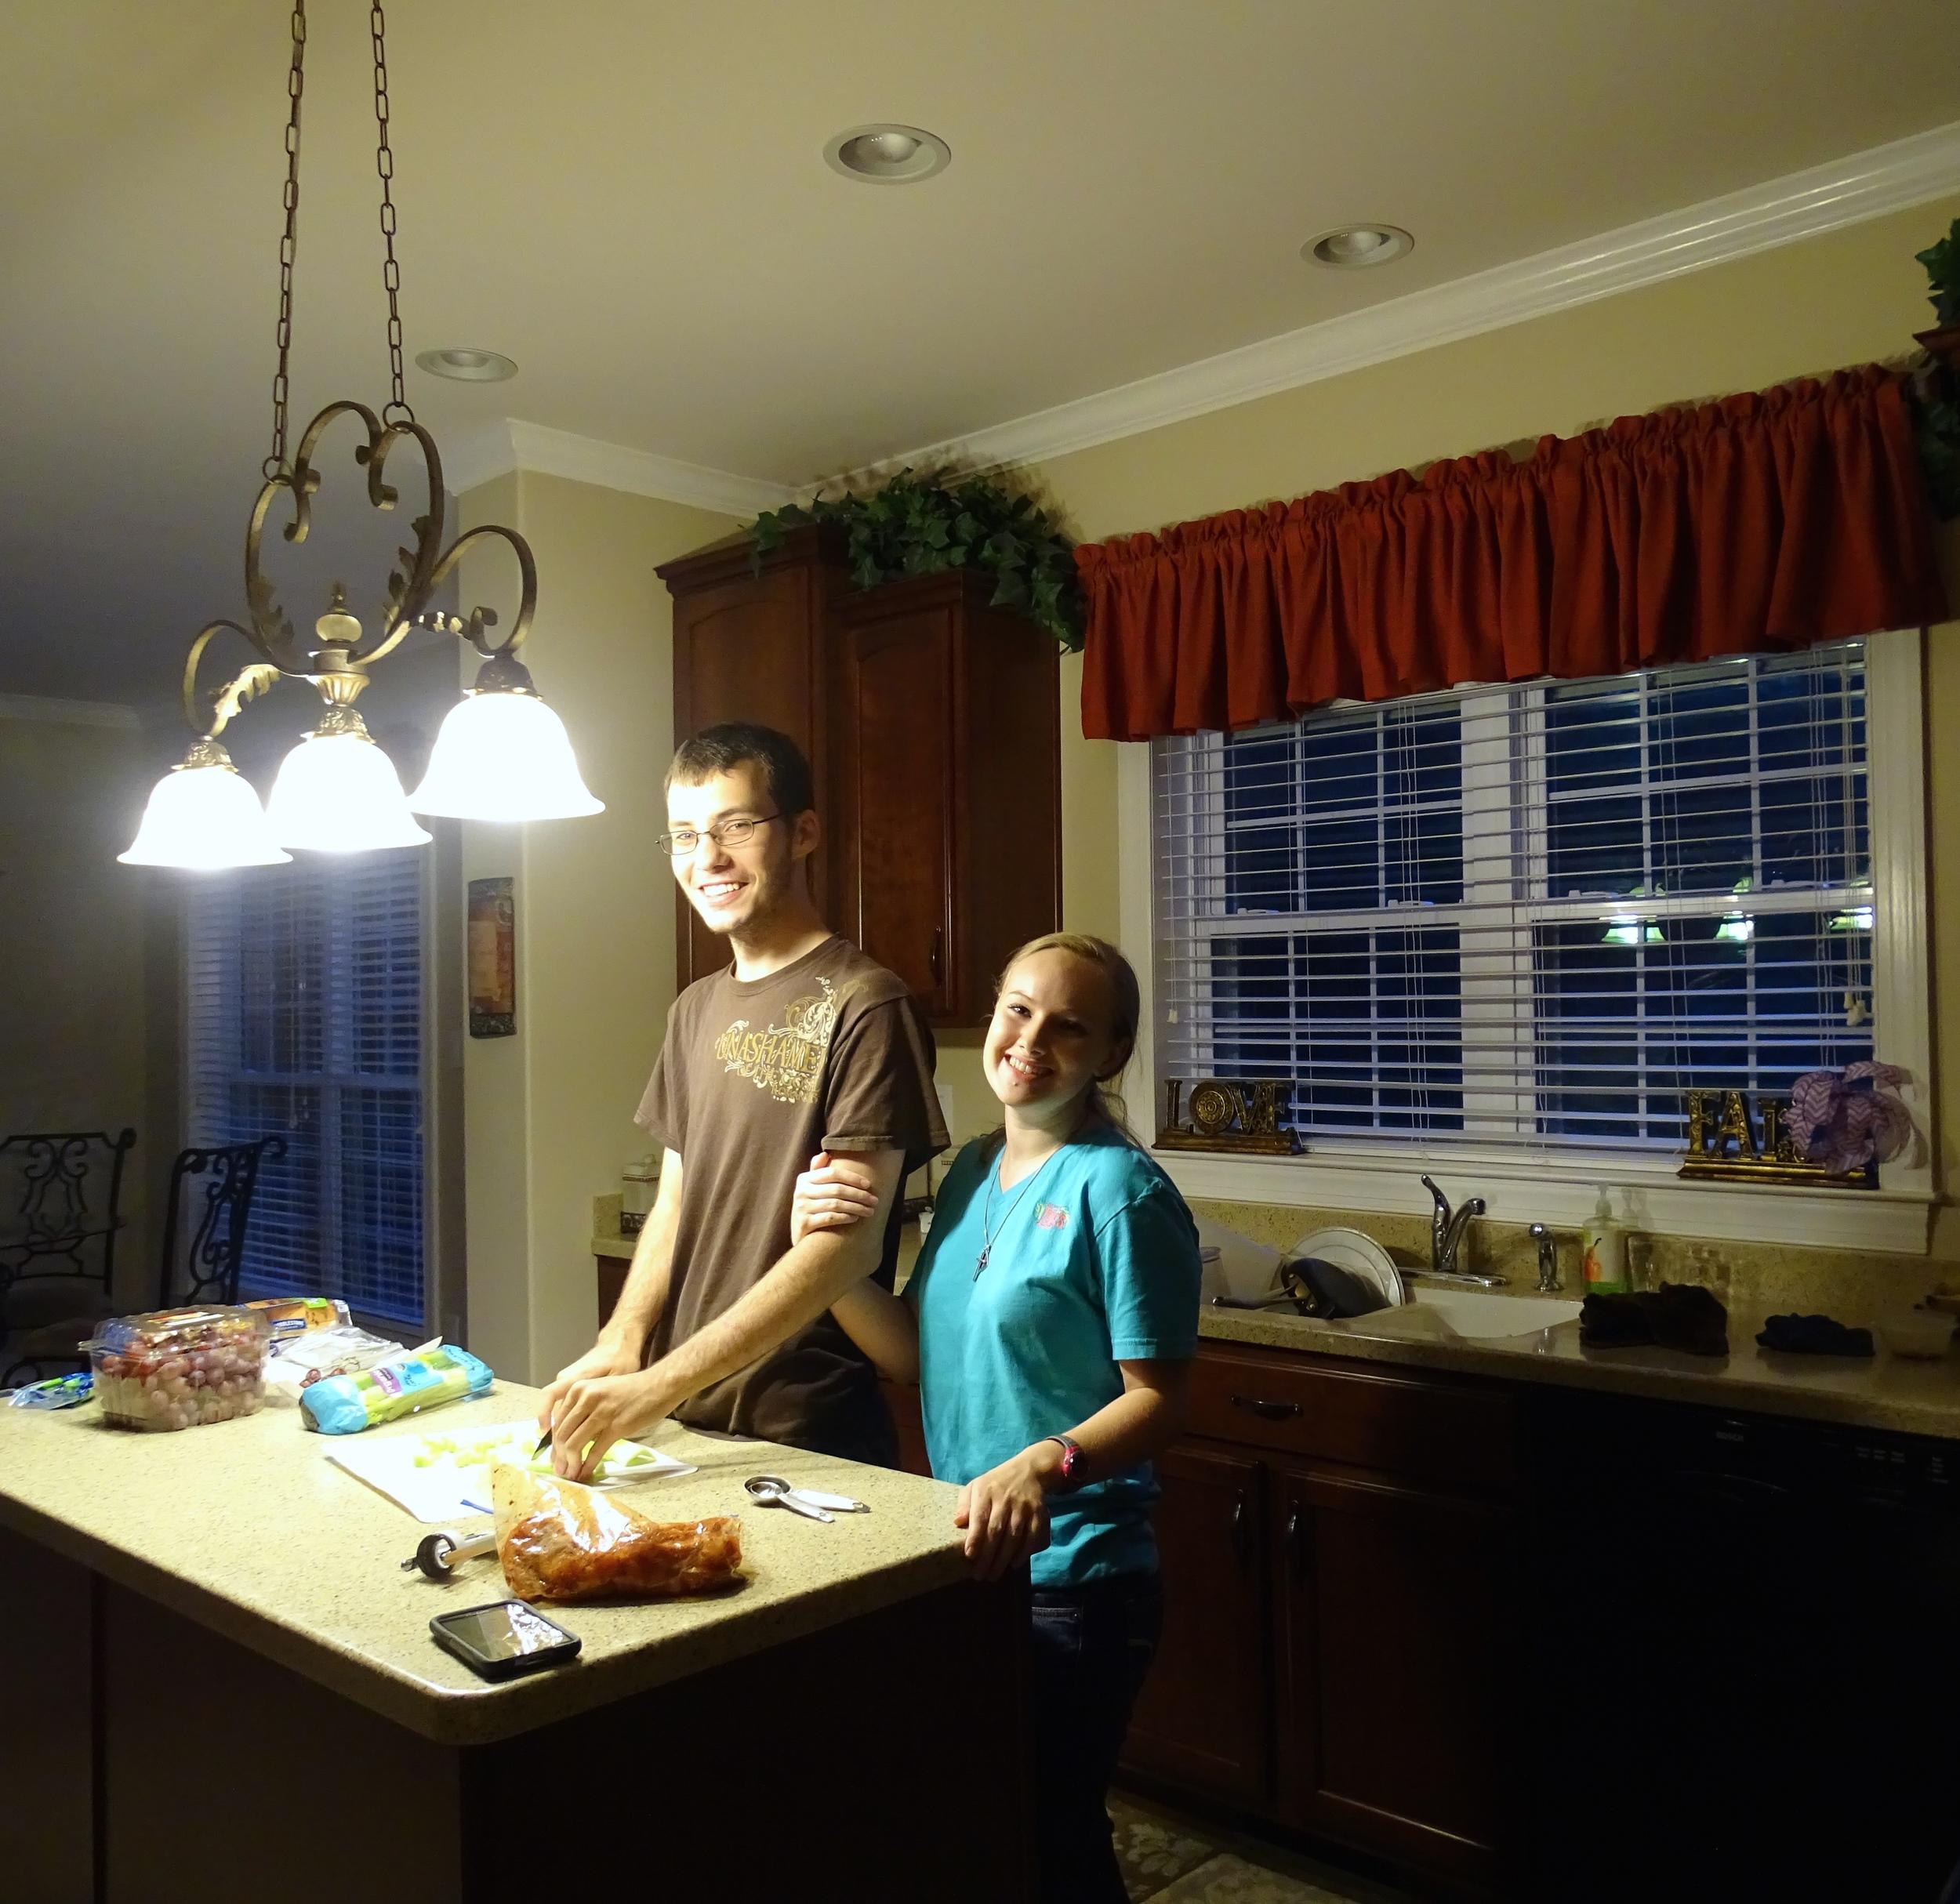 Zach & Danielle Making Dinner